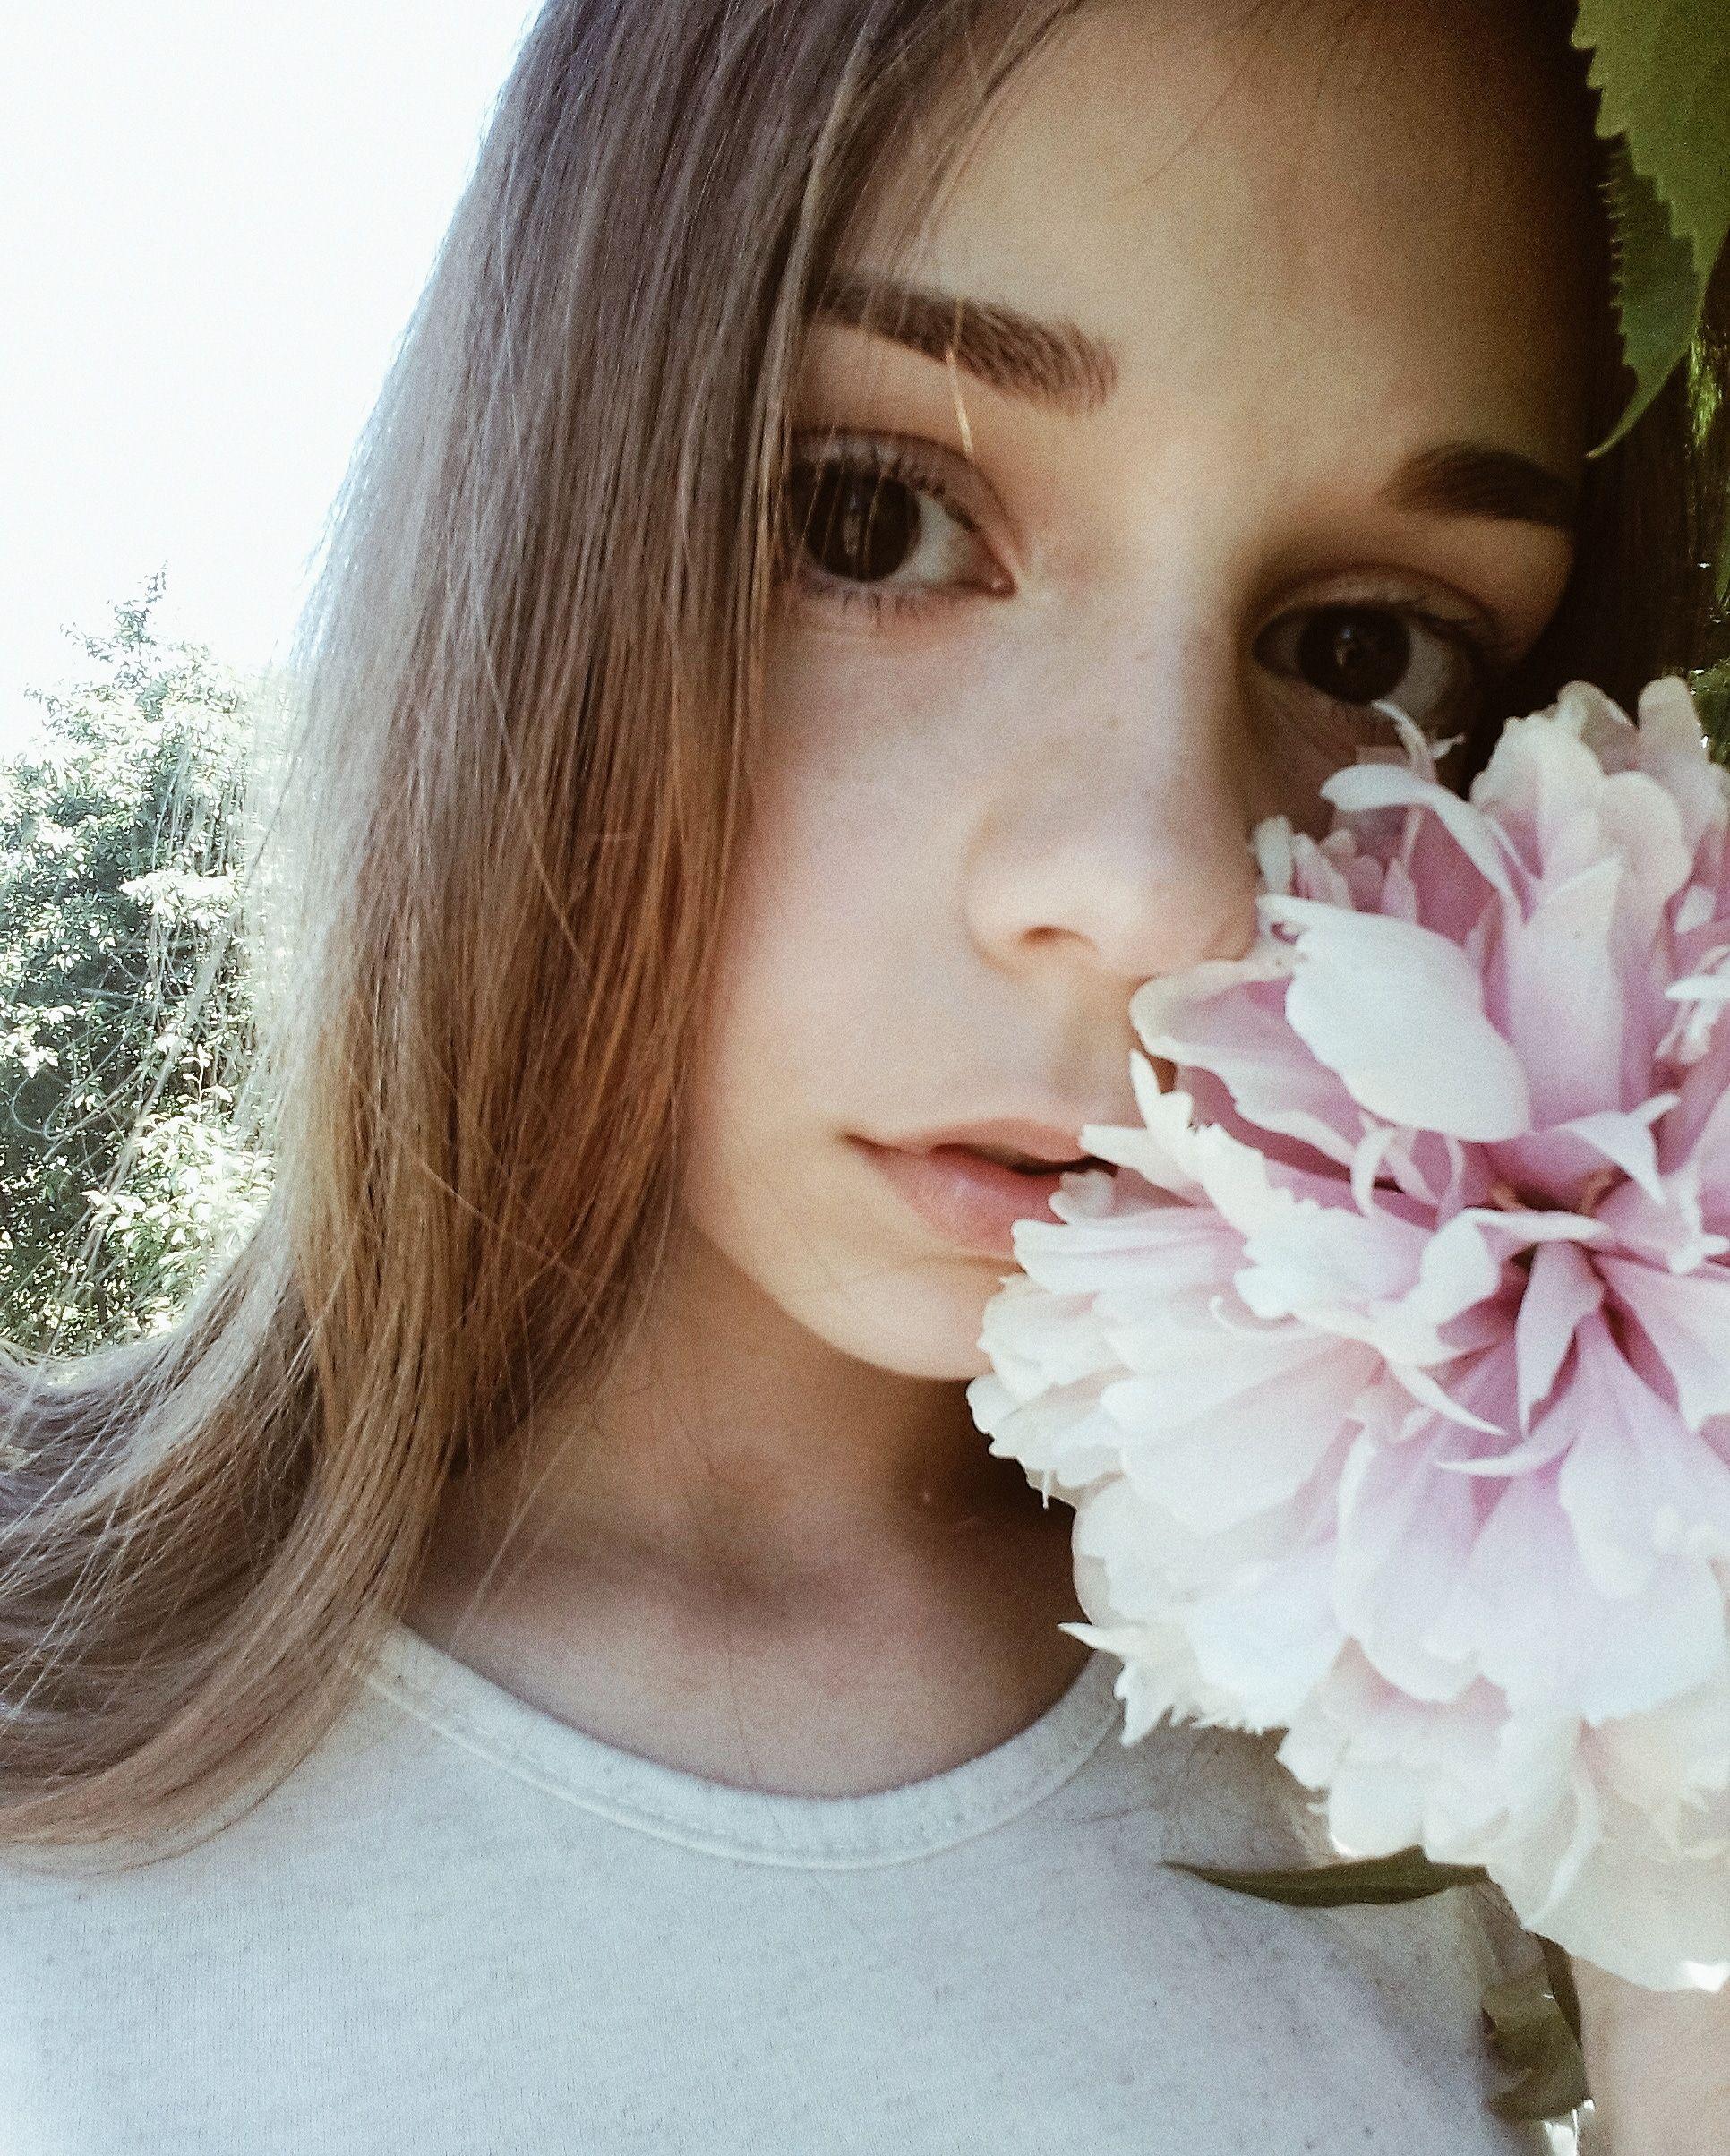 Селфи девушек дома 15 лет